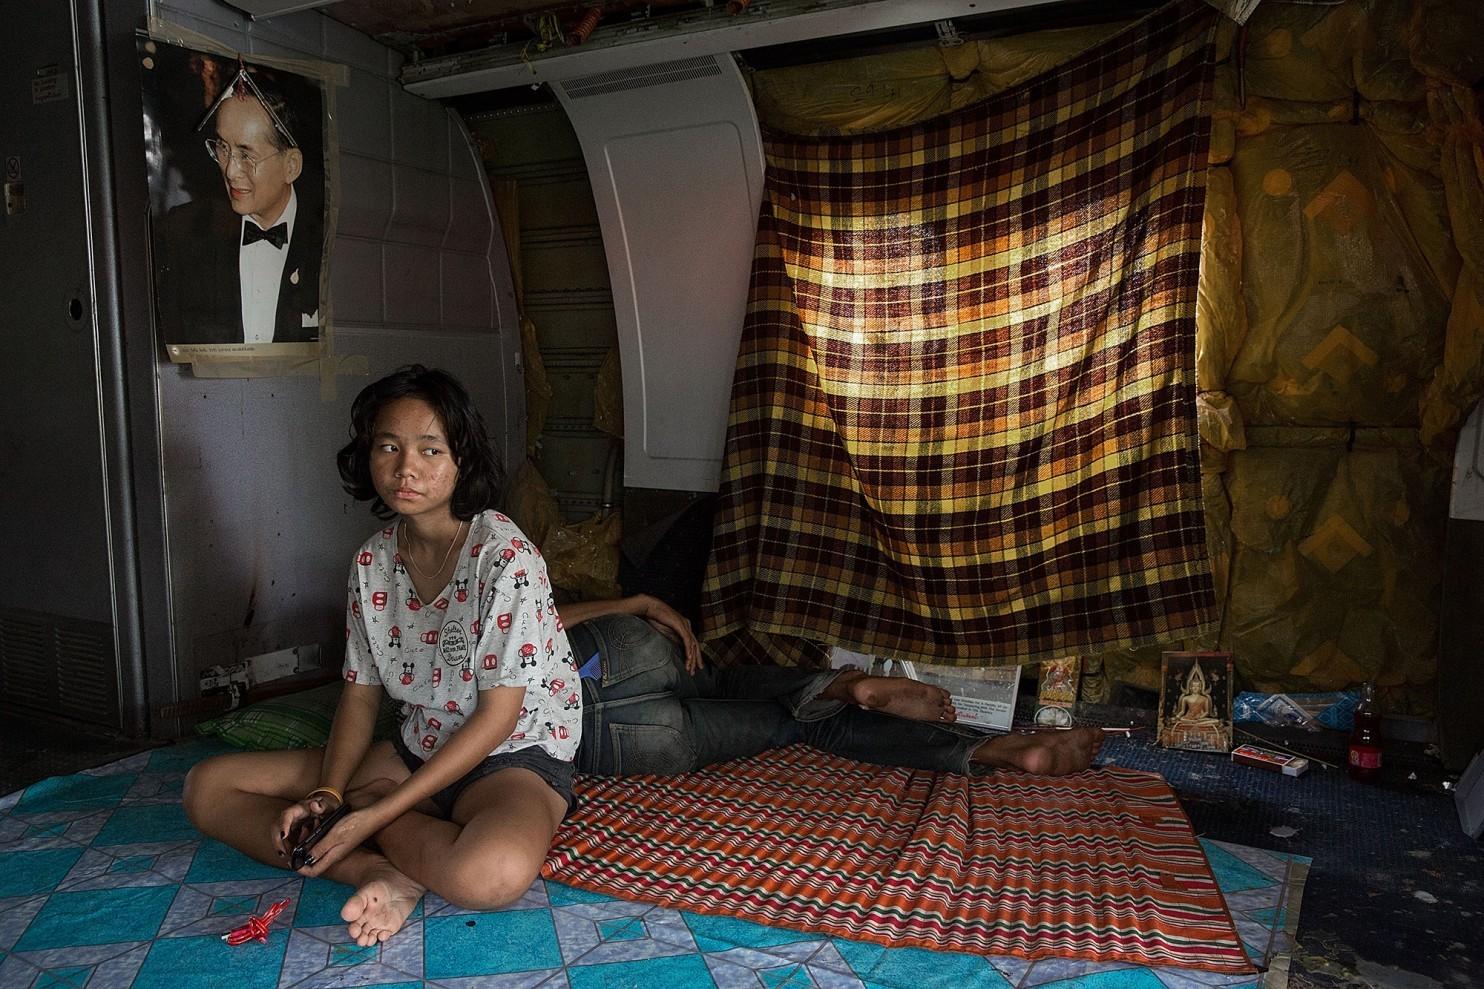 bangkok-airplanes-home-02